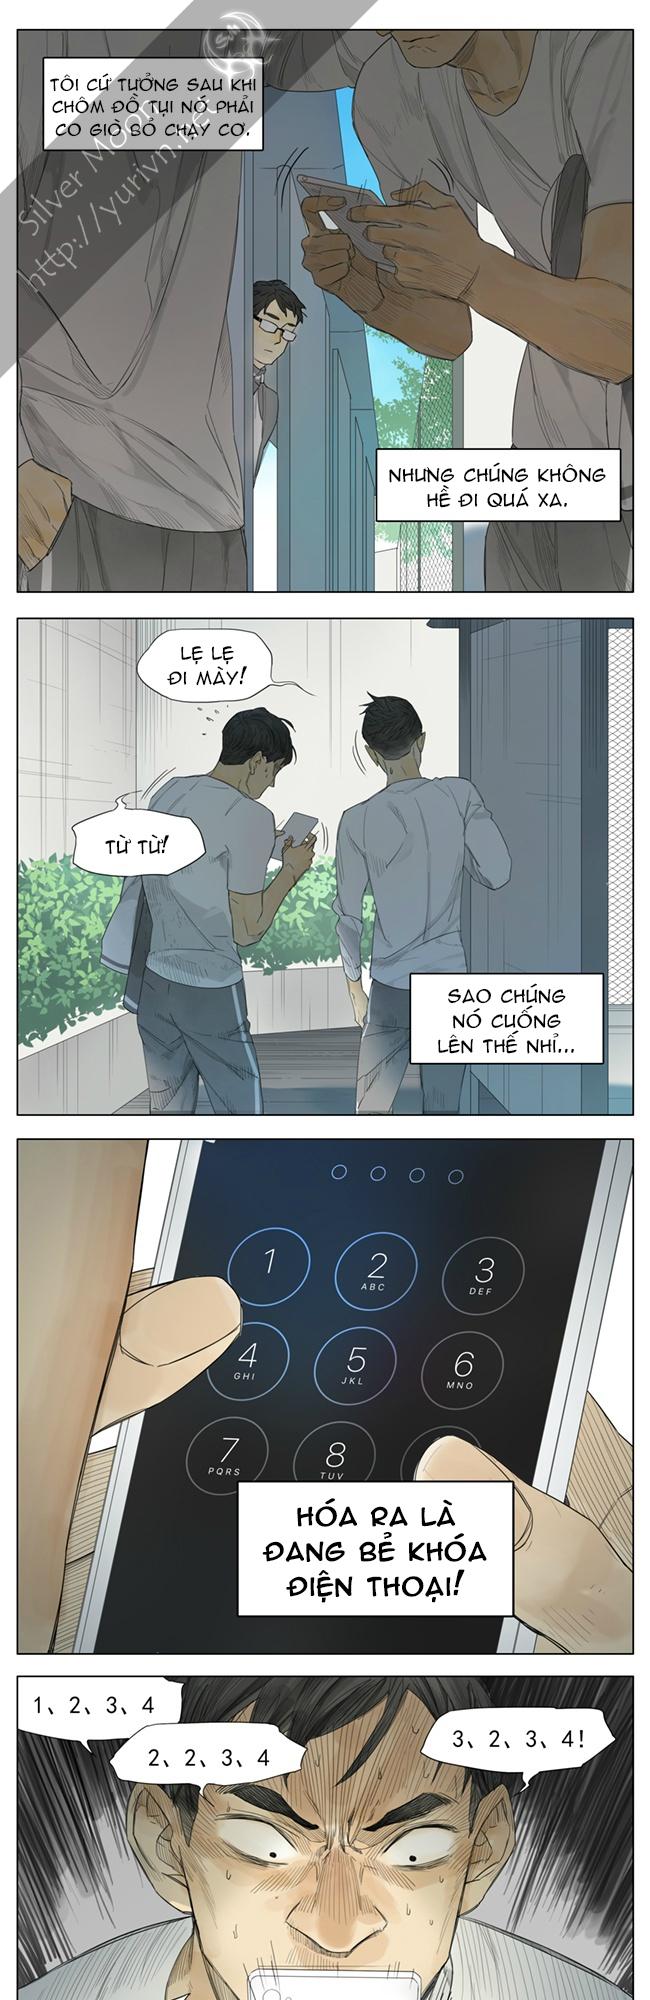 Chuyen-Cua-Ho-Chapter-47-P-1-0